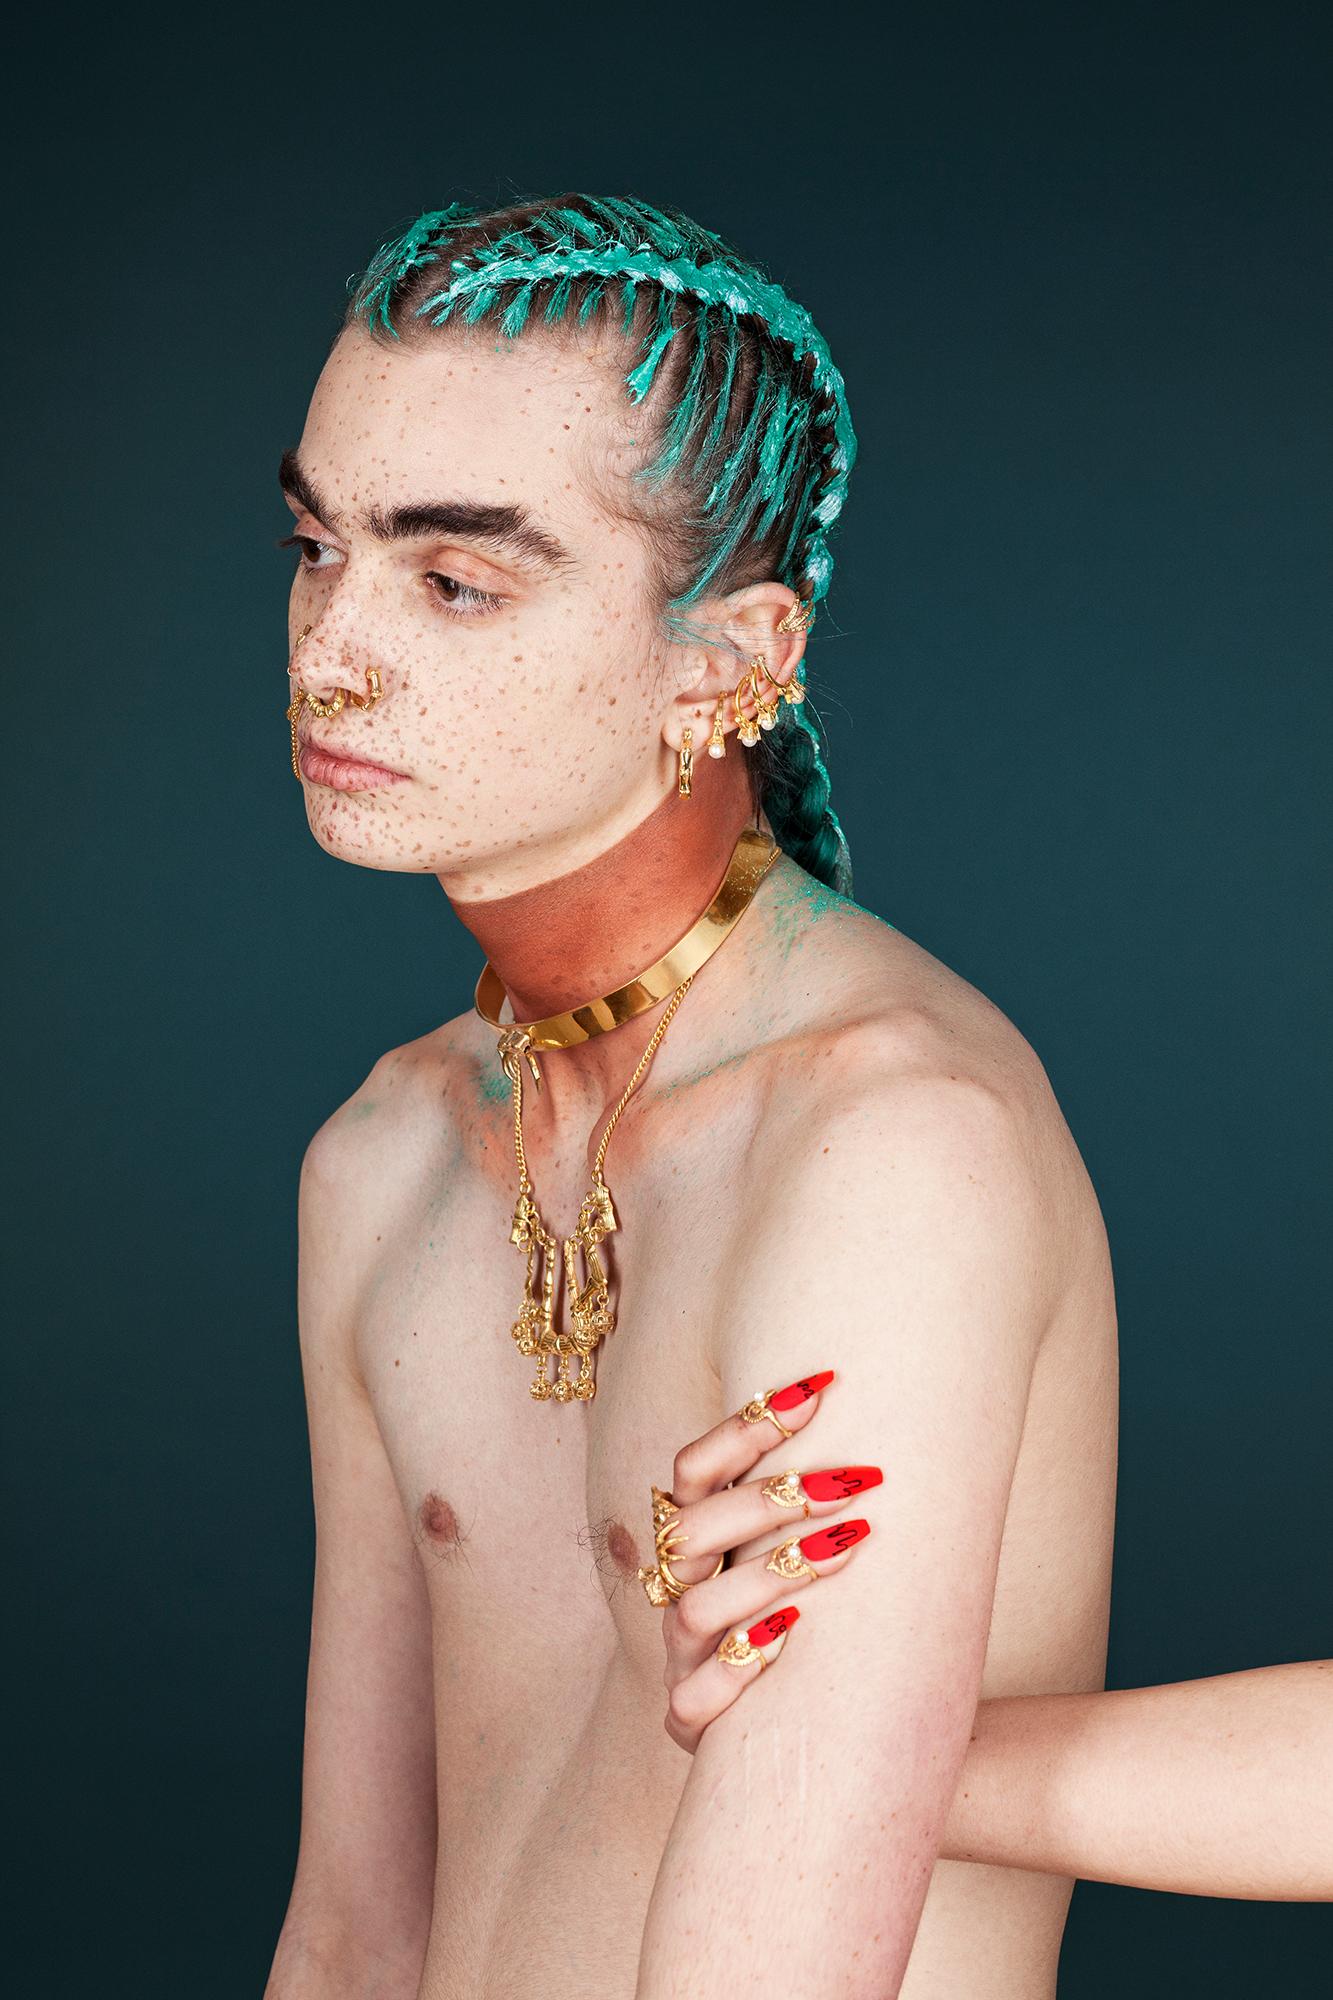 05_Daniel-Bolliger_fotografier_fuer_Chris-Habana-Jewelry-NYC_Kampagne-web.jpg